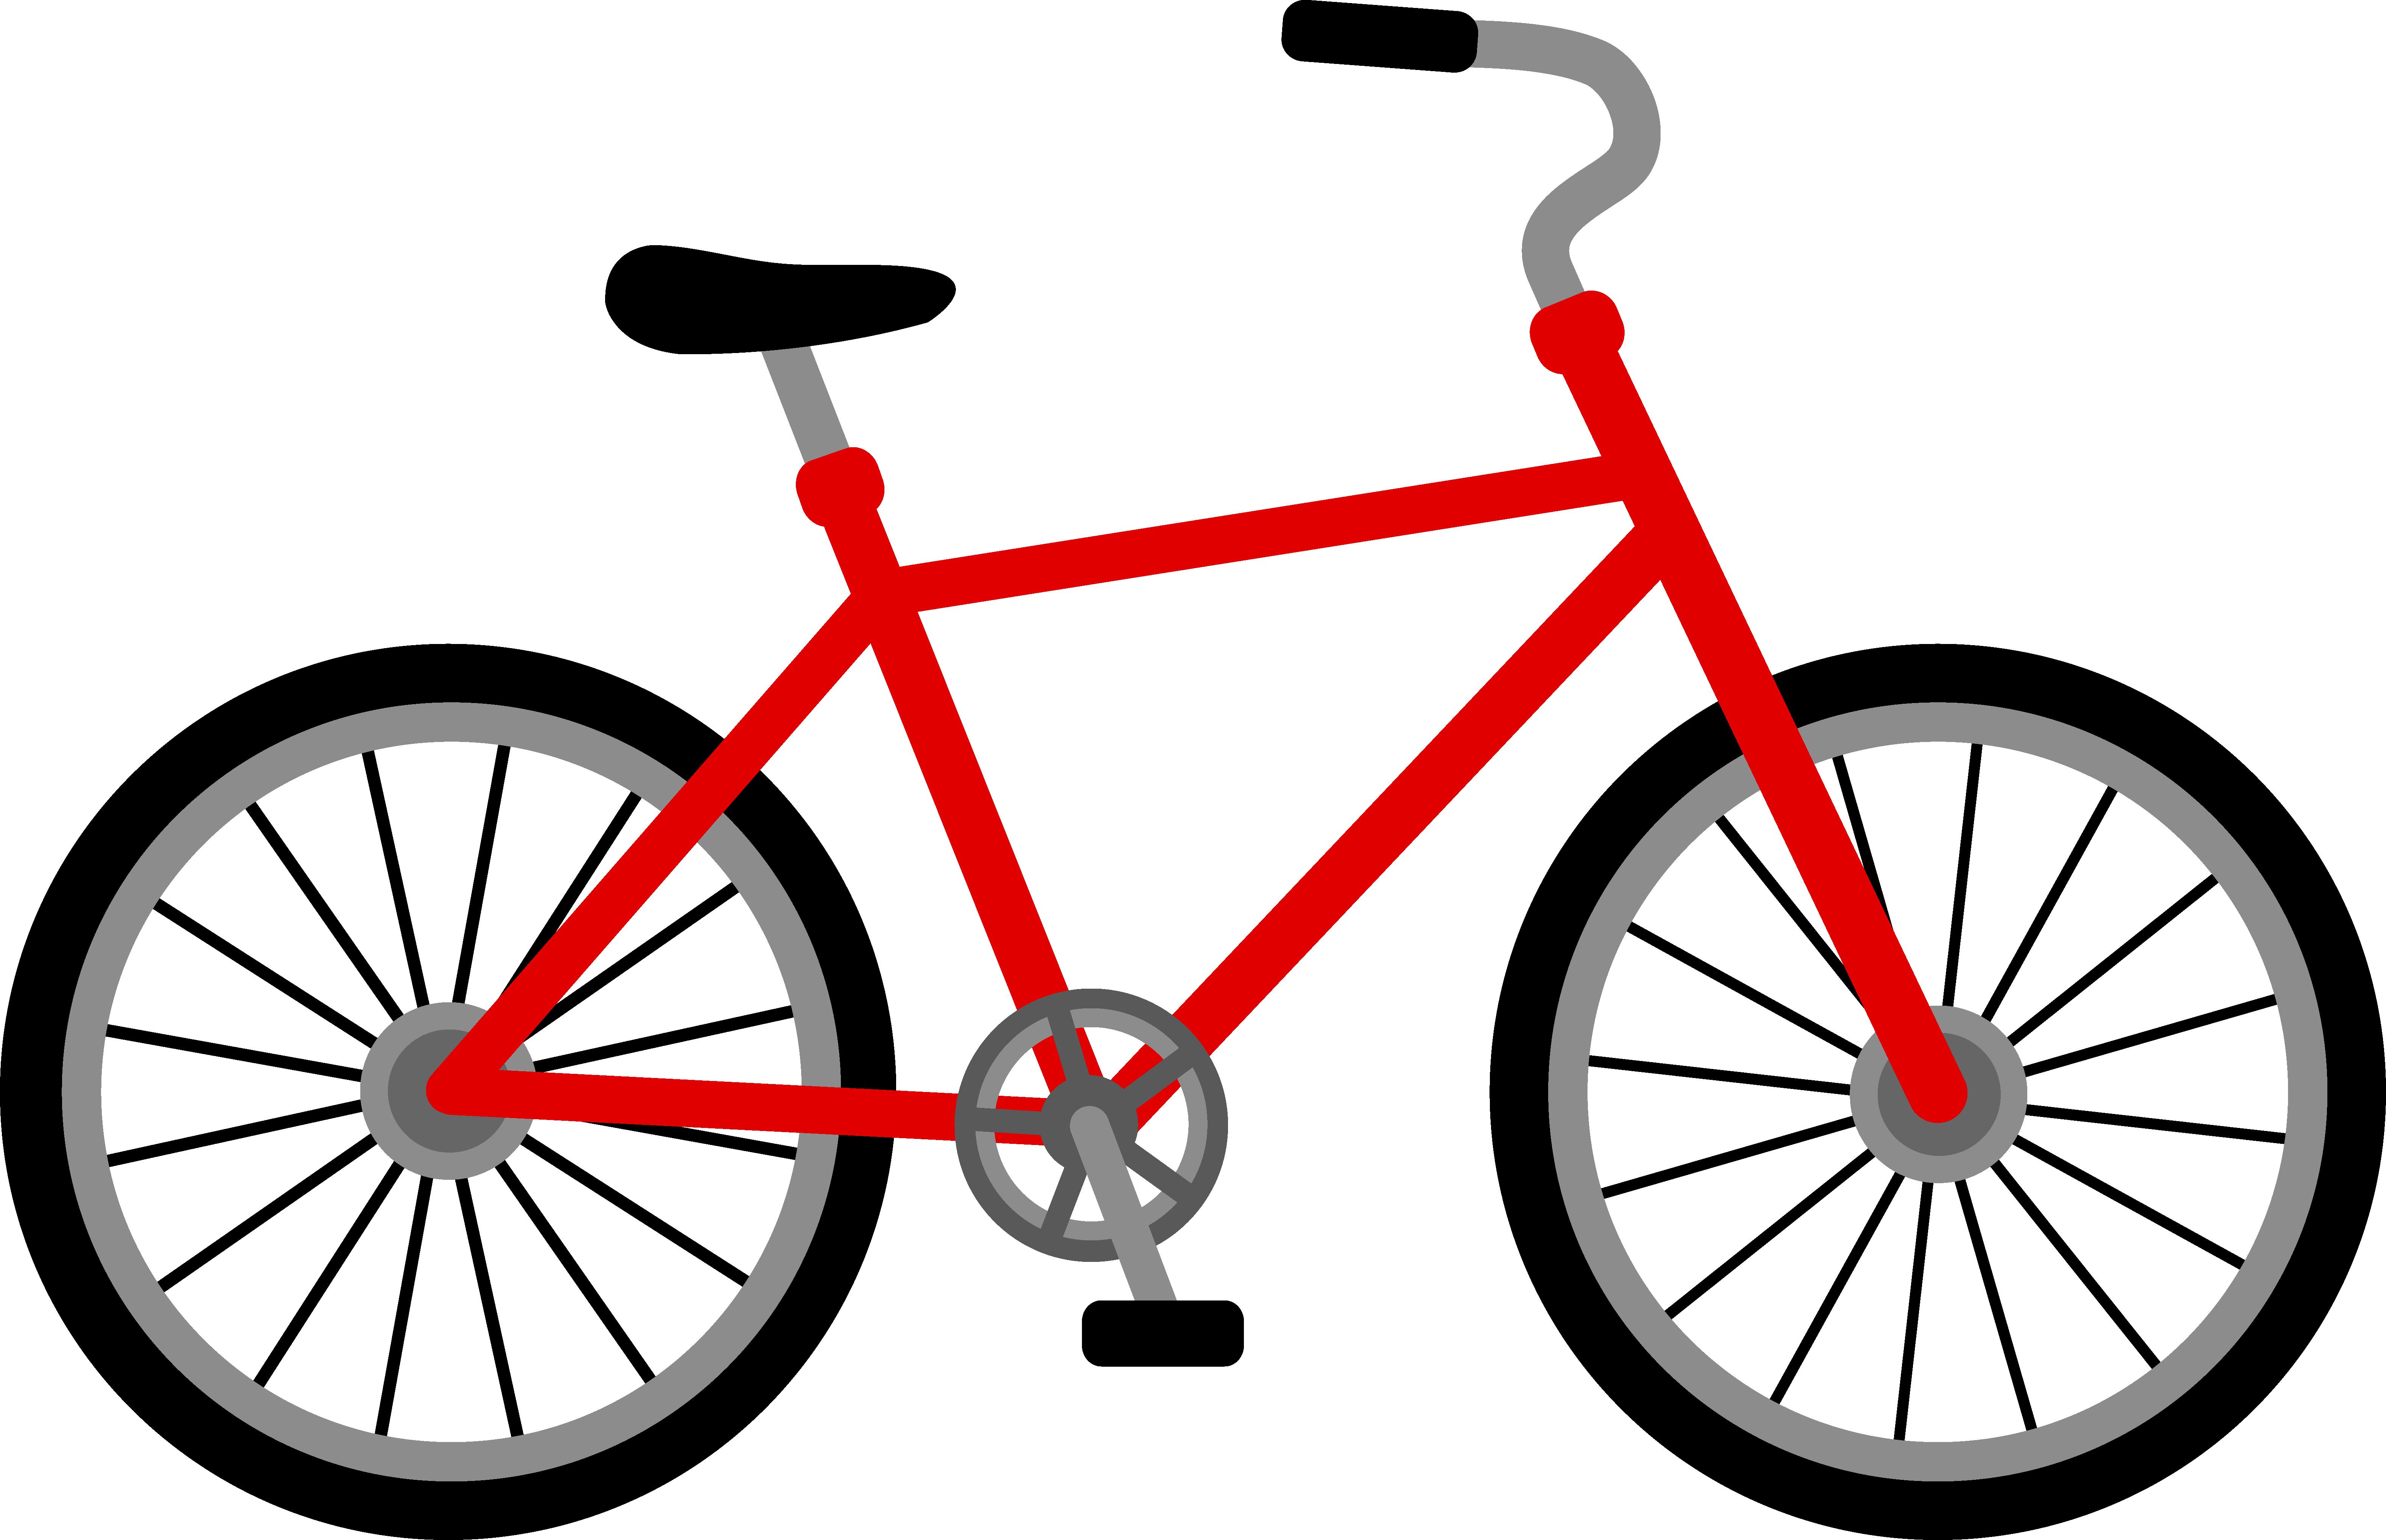 cycle clipart u0026middot; bike clipart-cycle clipart u0026middot; bike clipart-0